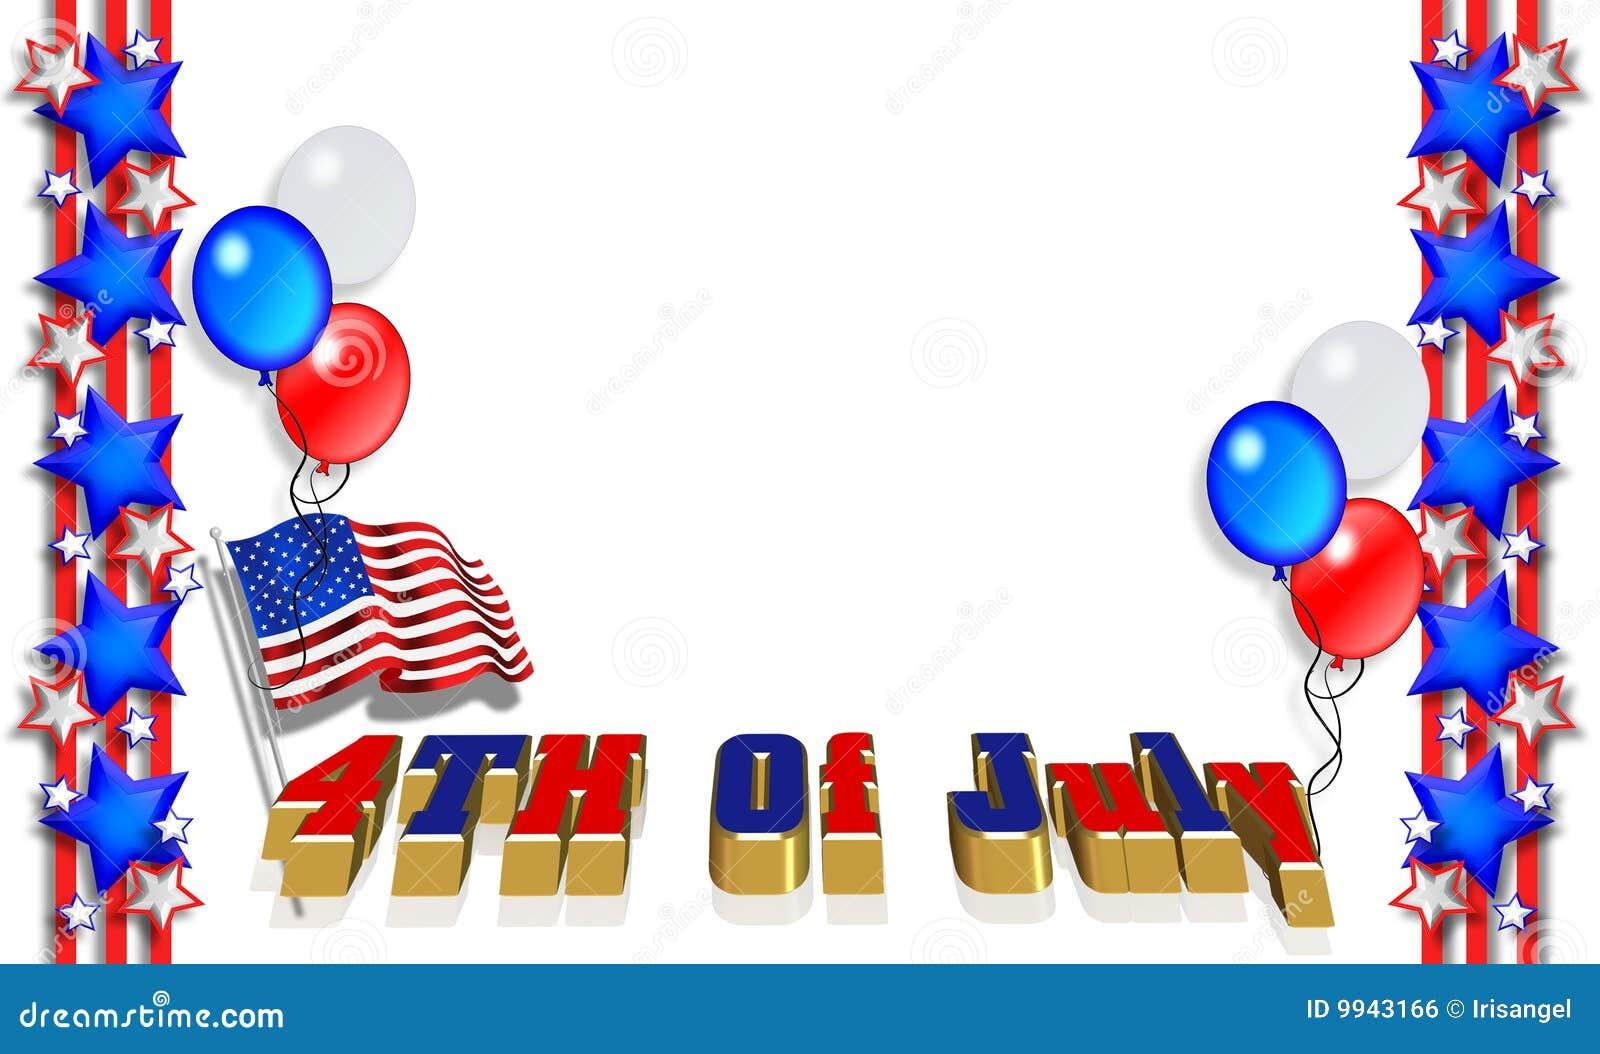 Patriotic Border 4th of July Royalty Free Stock Image